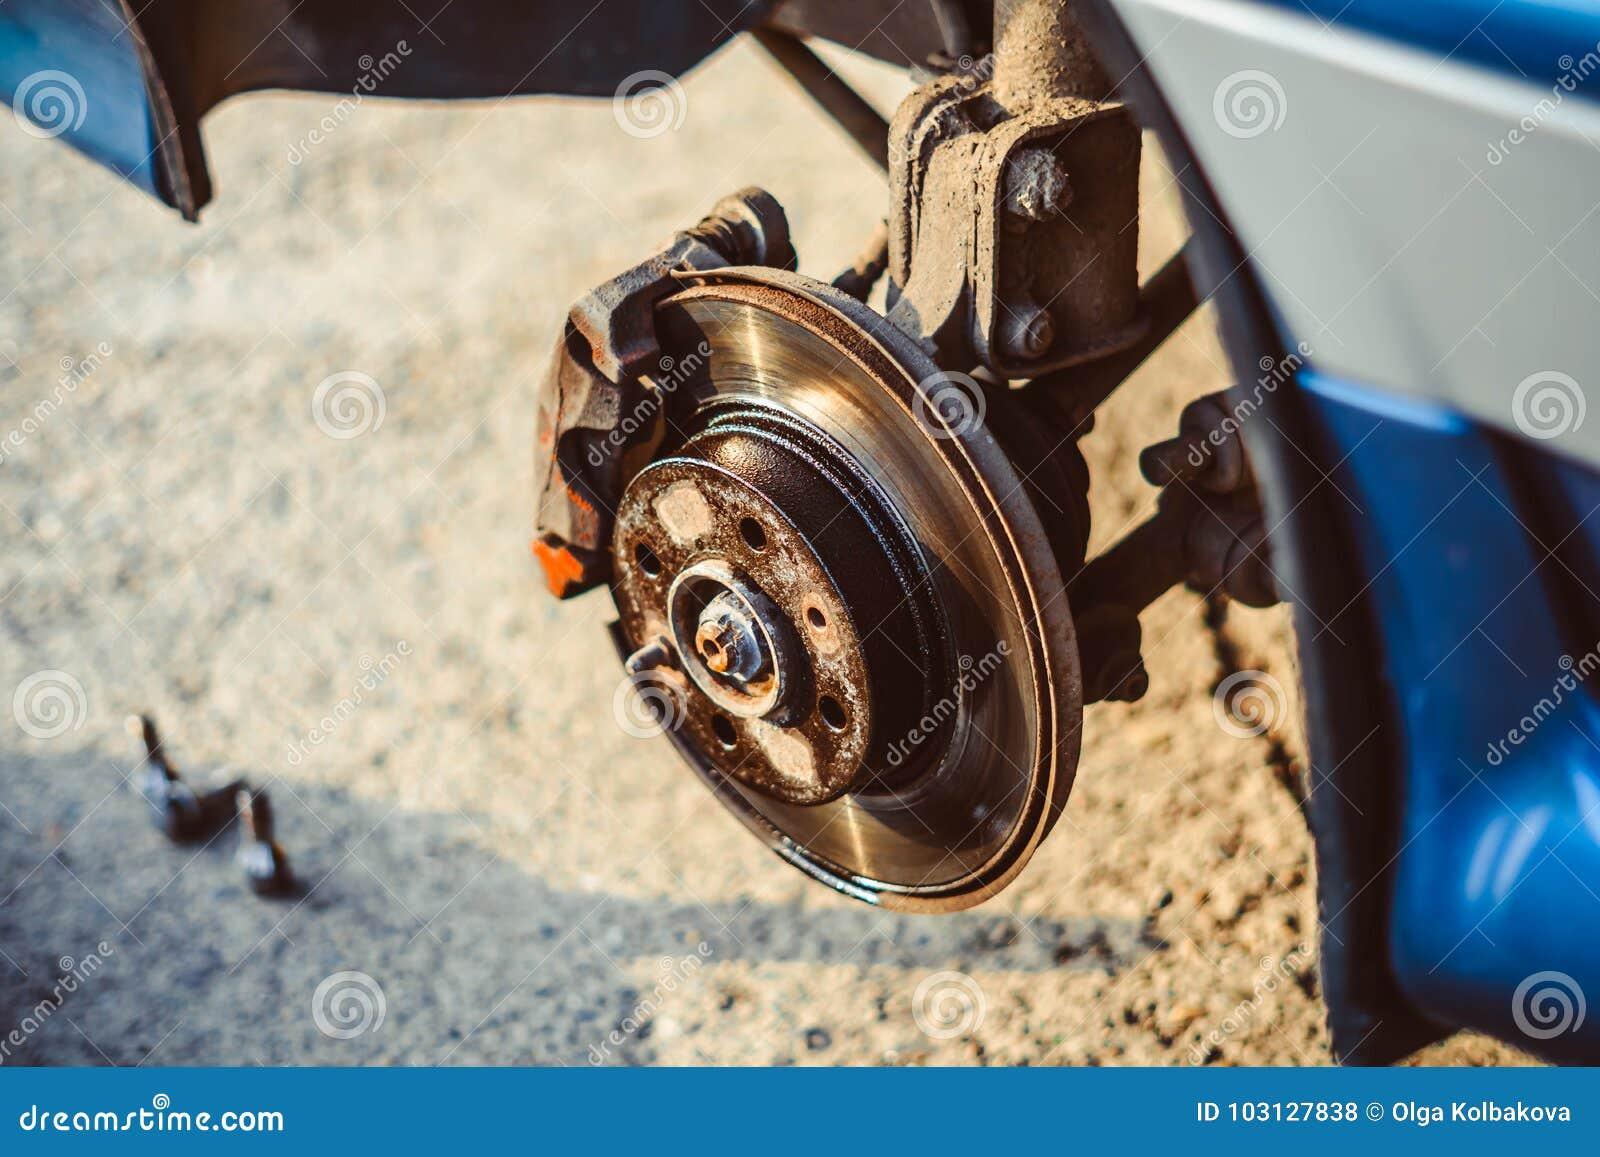 Disc brake of the vehicle for repair.